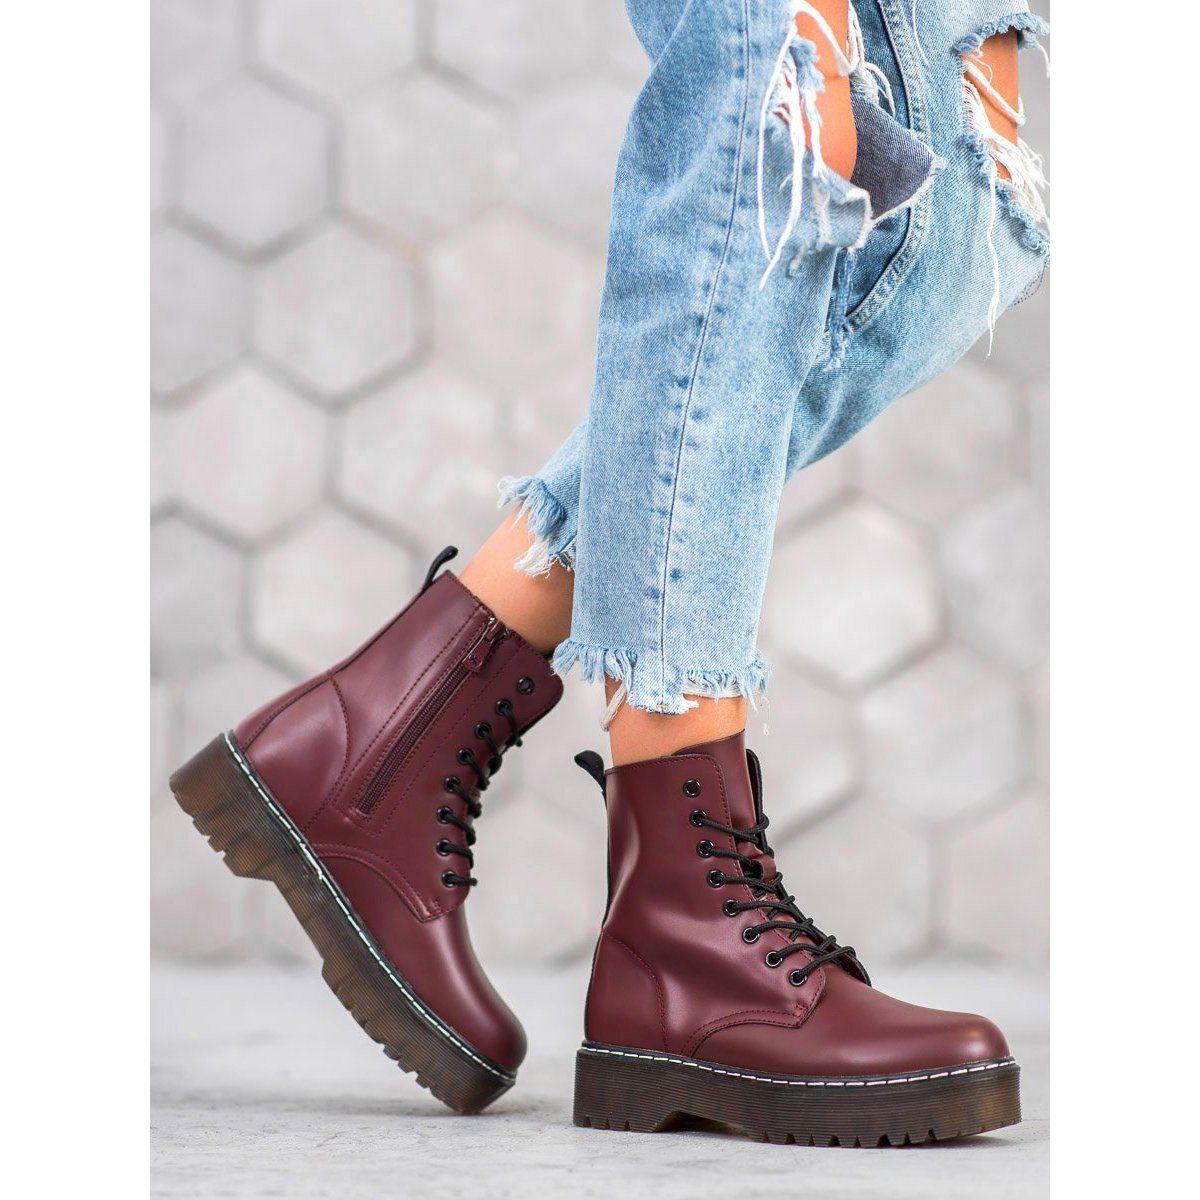 Kylie Glany Na Platformie Czerwone Platform Shoes Platform Boots Boot Shoes Women